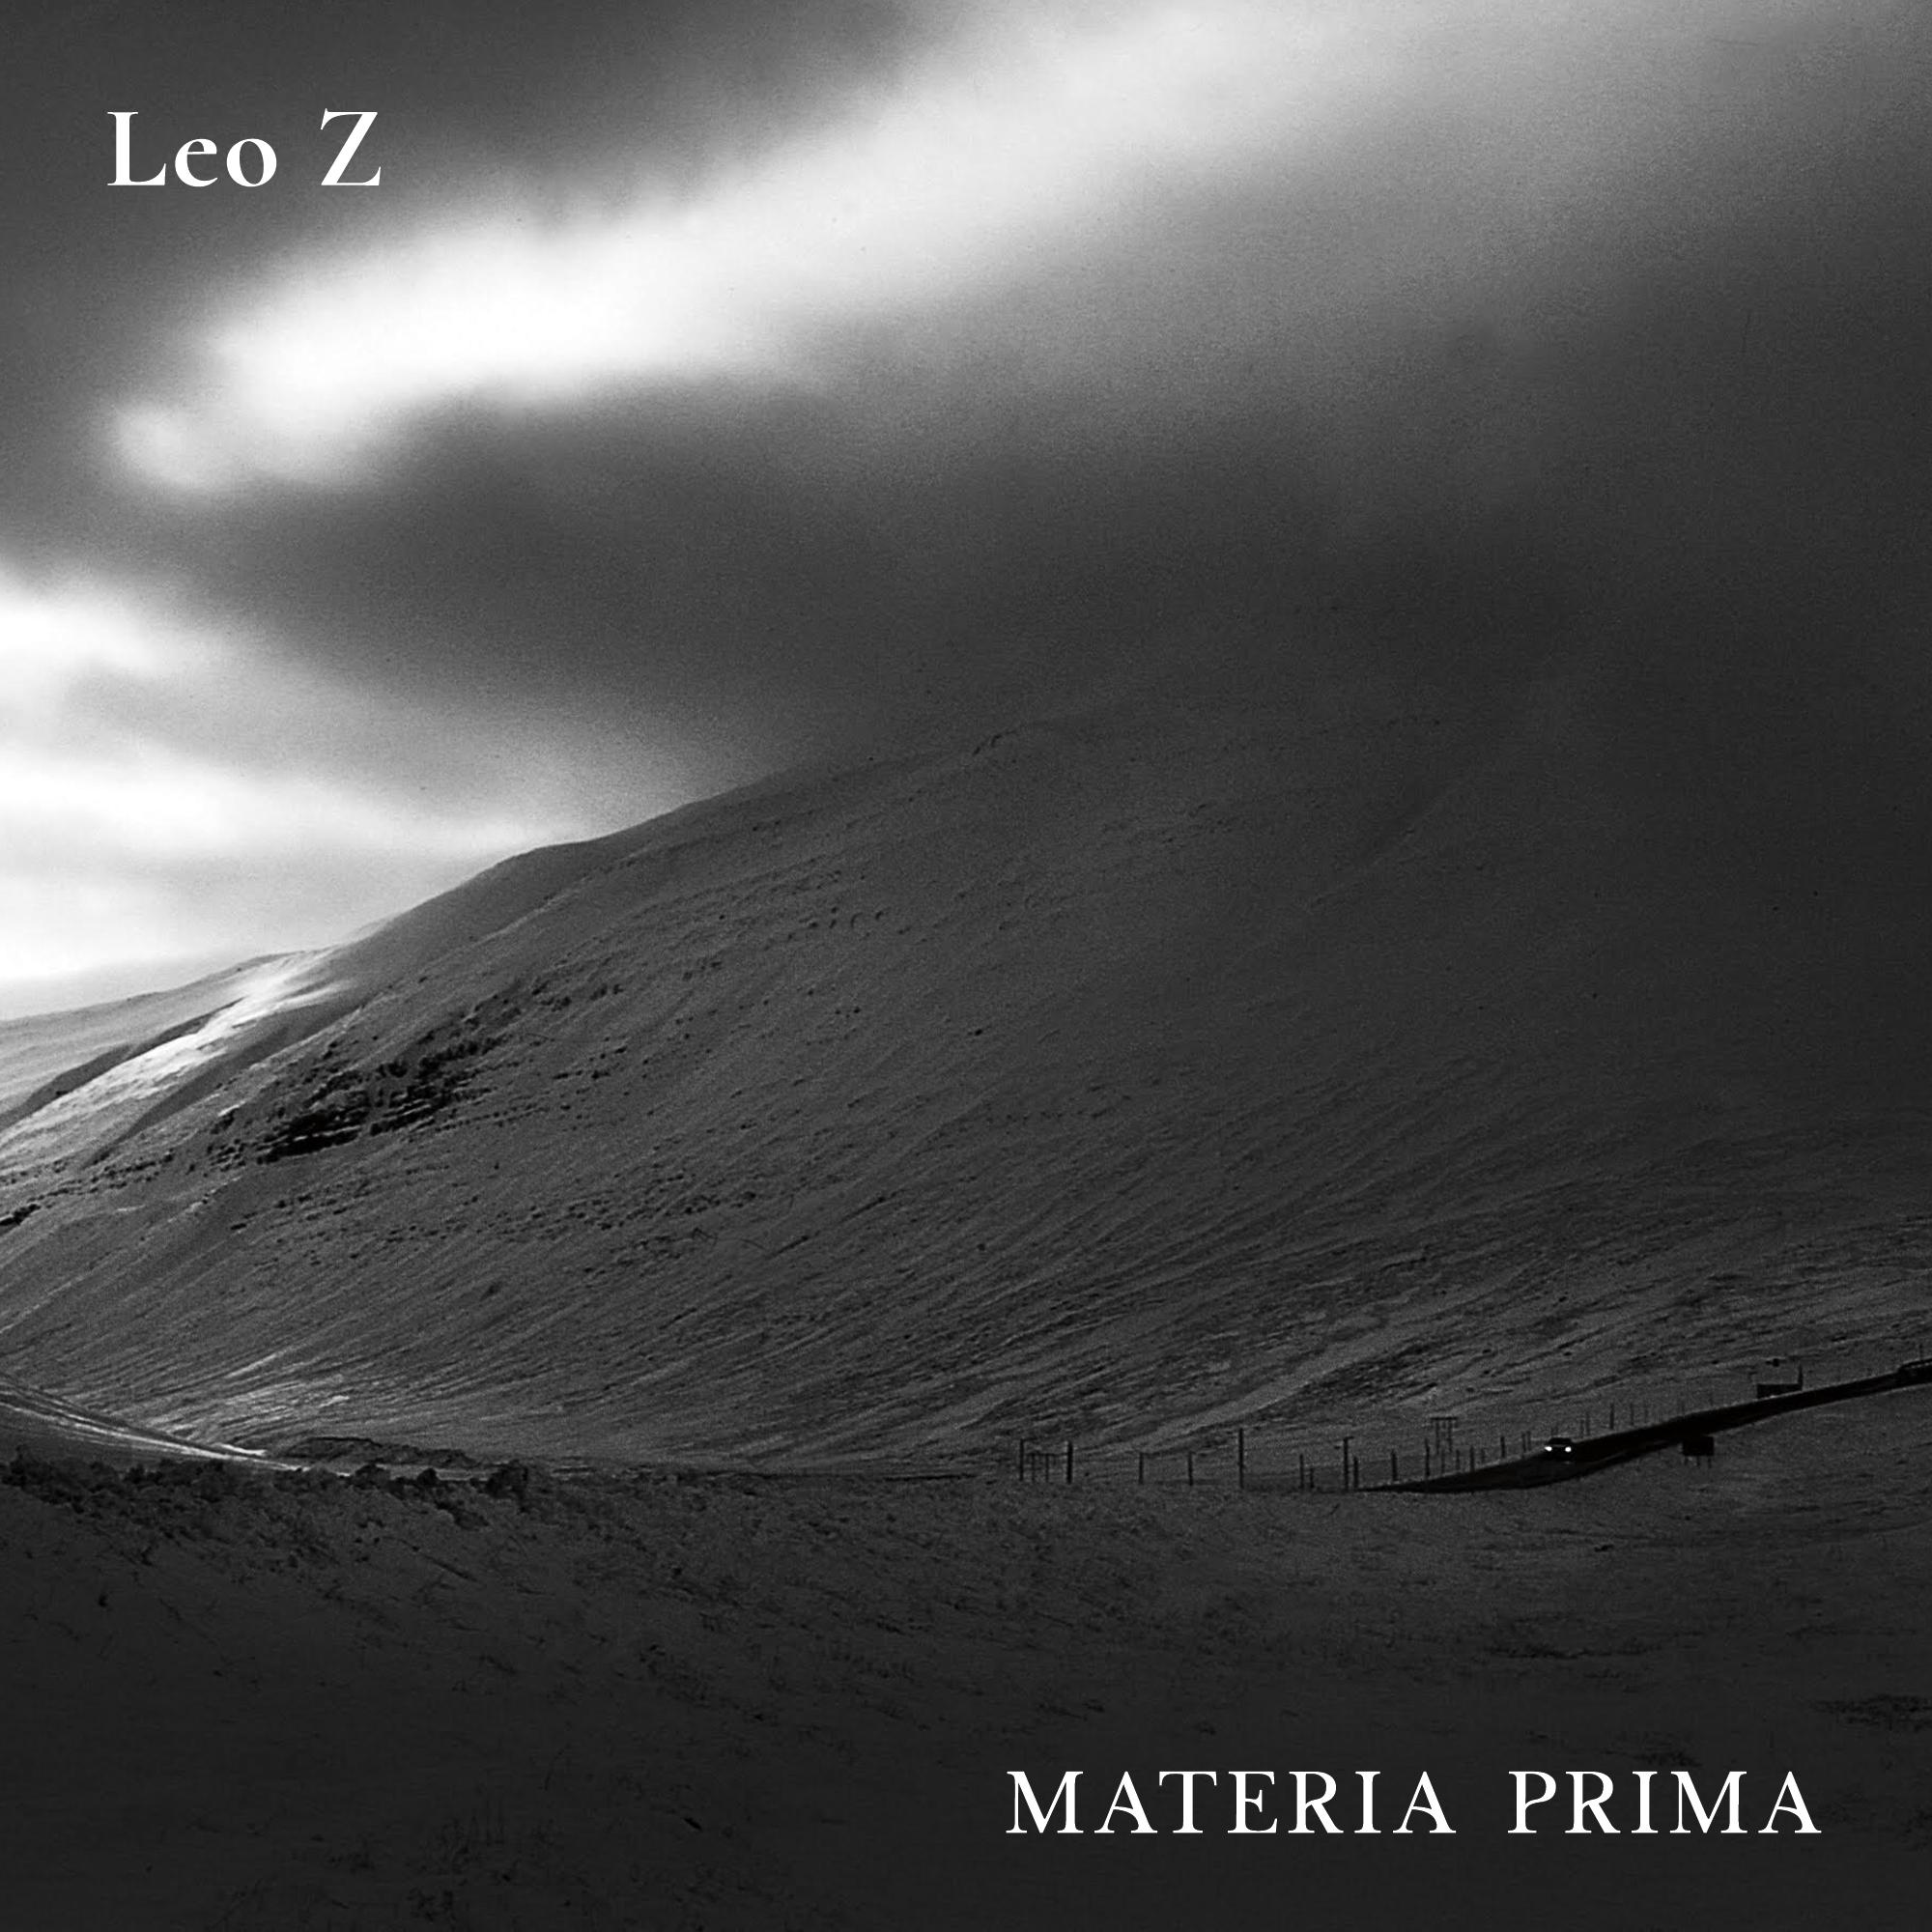 Leo Z - Materia Prima - Cover Image